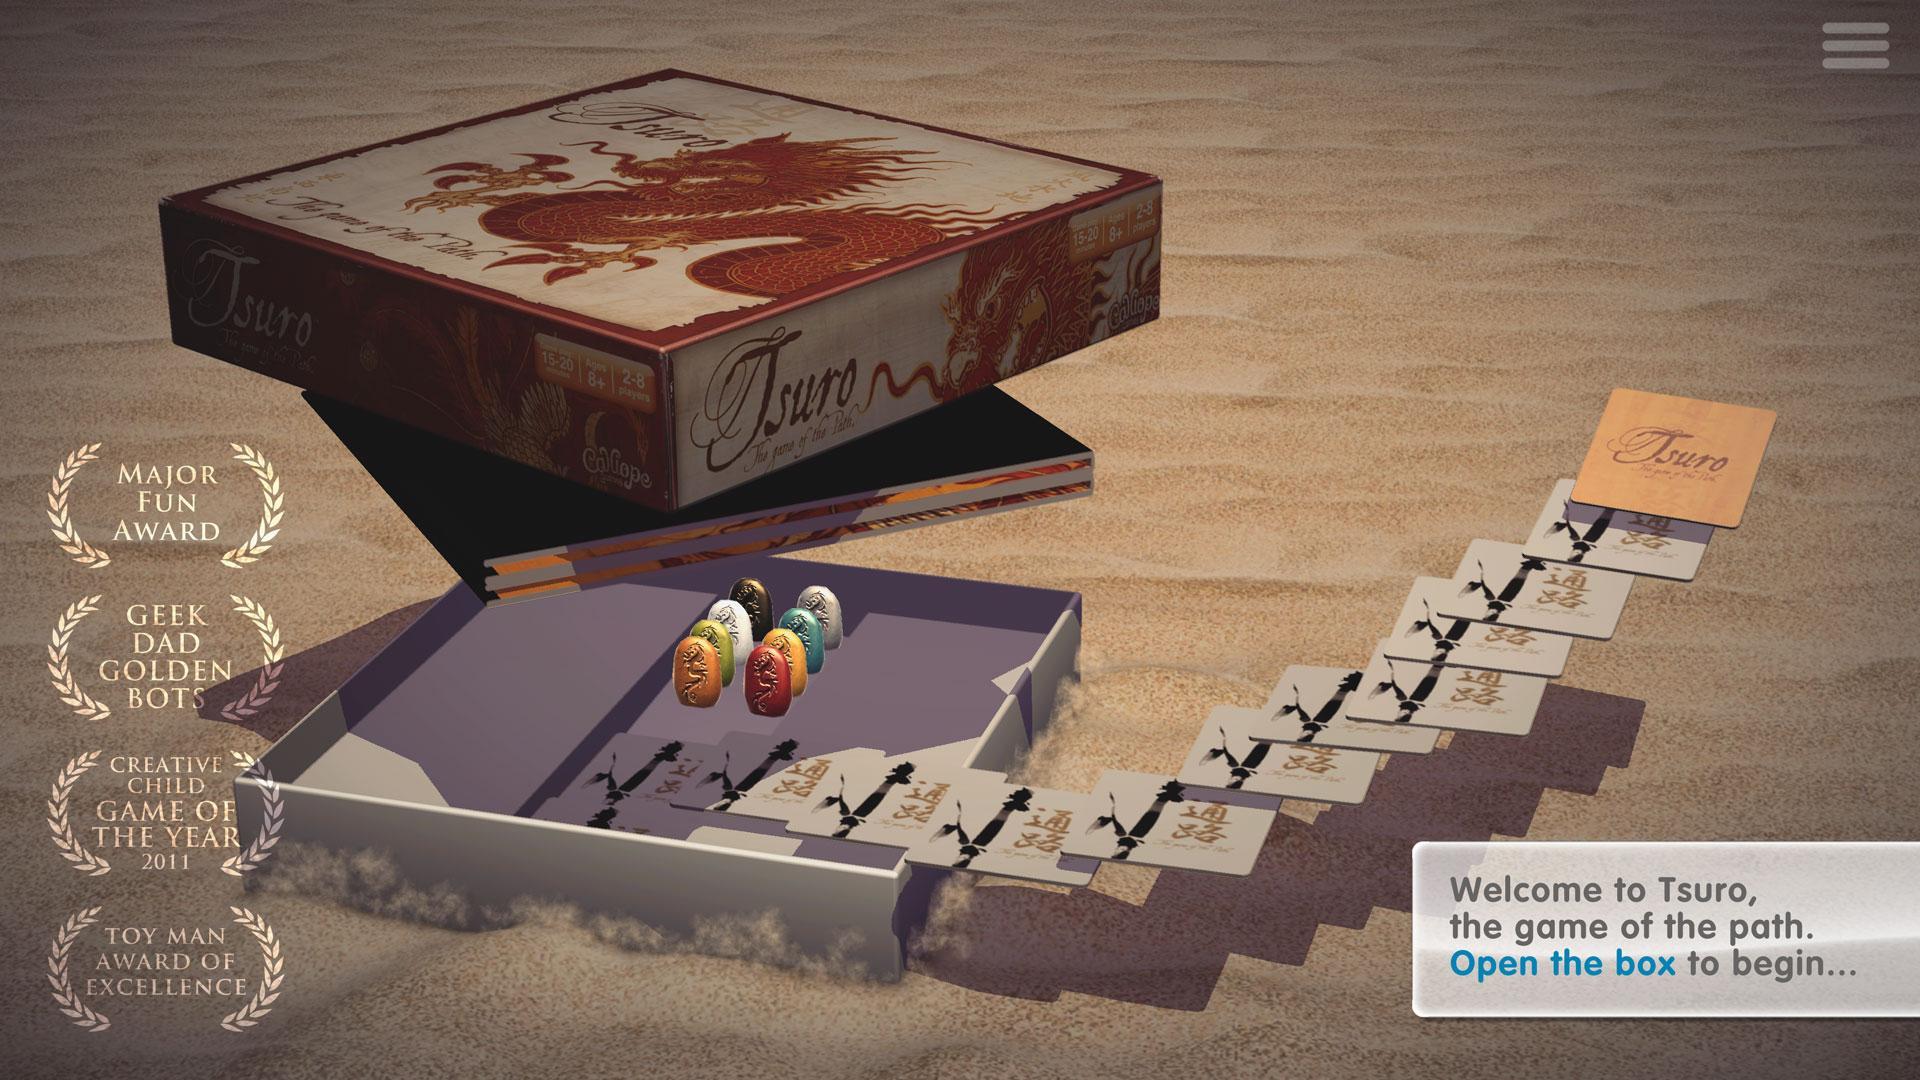 Tsuro - The Game of the Path screenshot #9